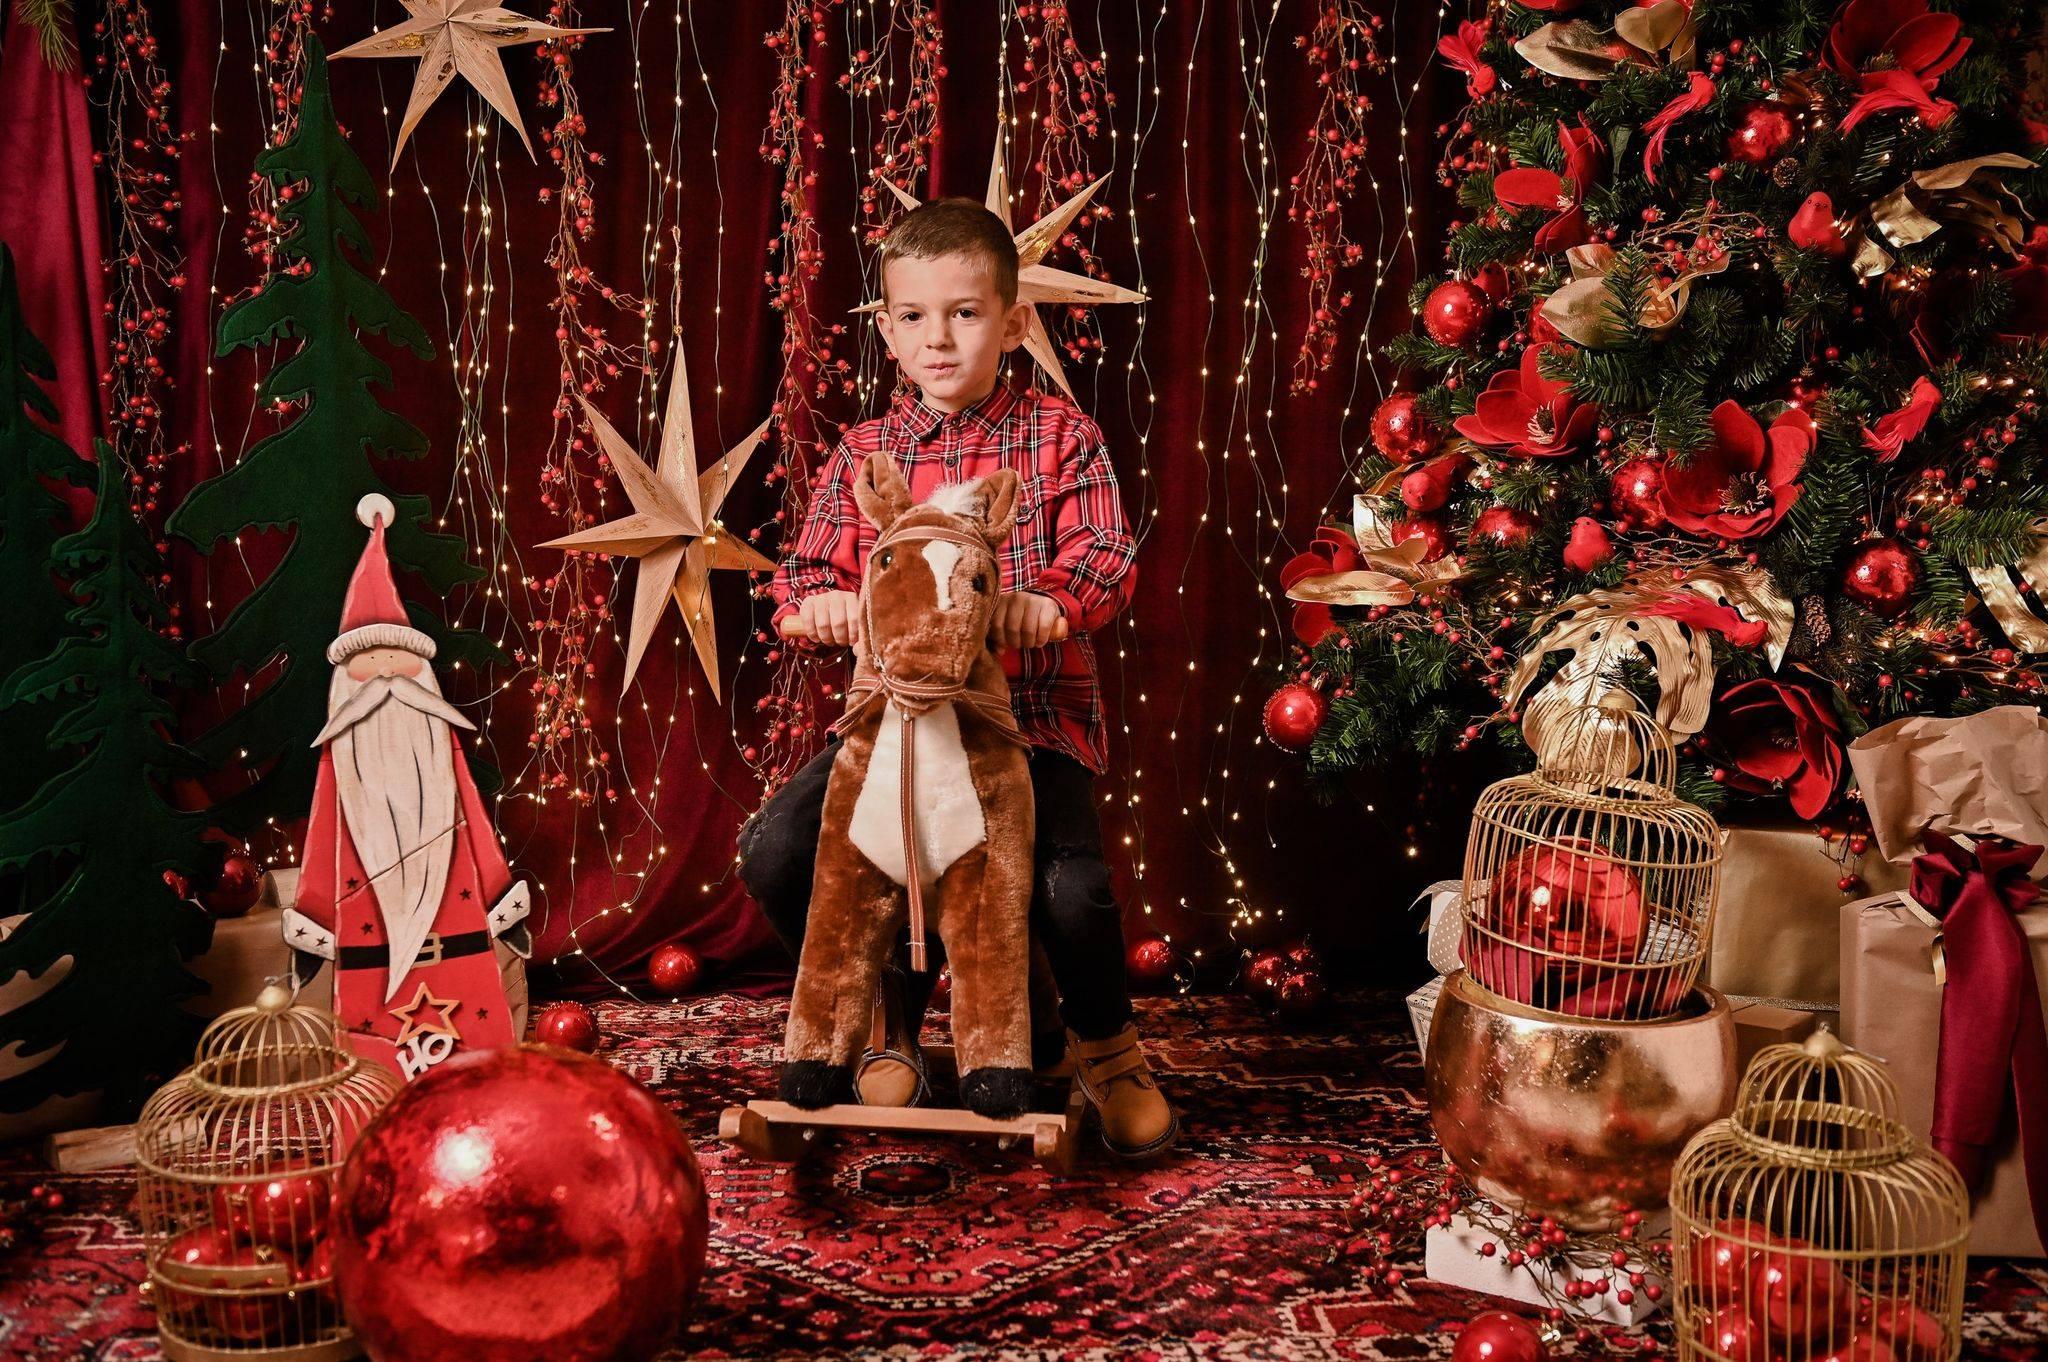 Extravagant experience: božićno fotografiranje u La Vie Photo Atelieru